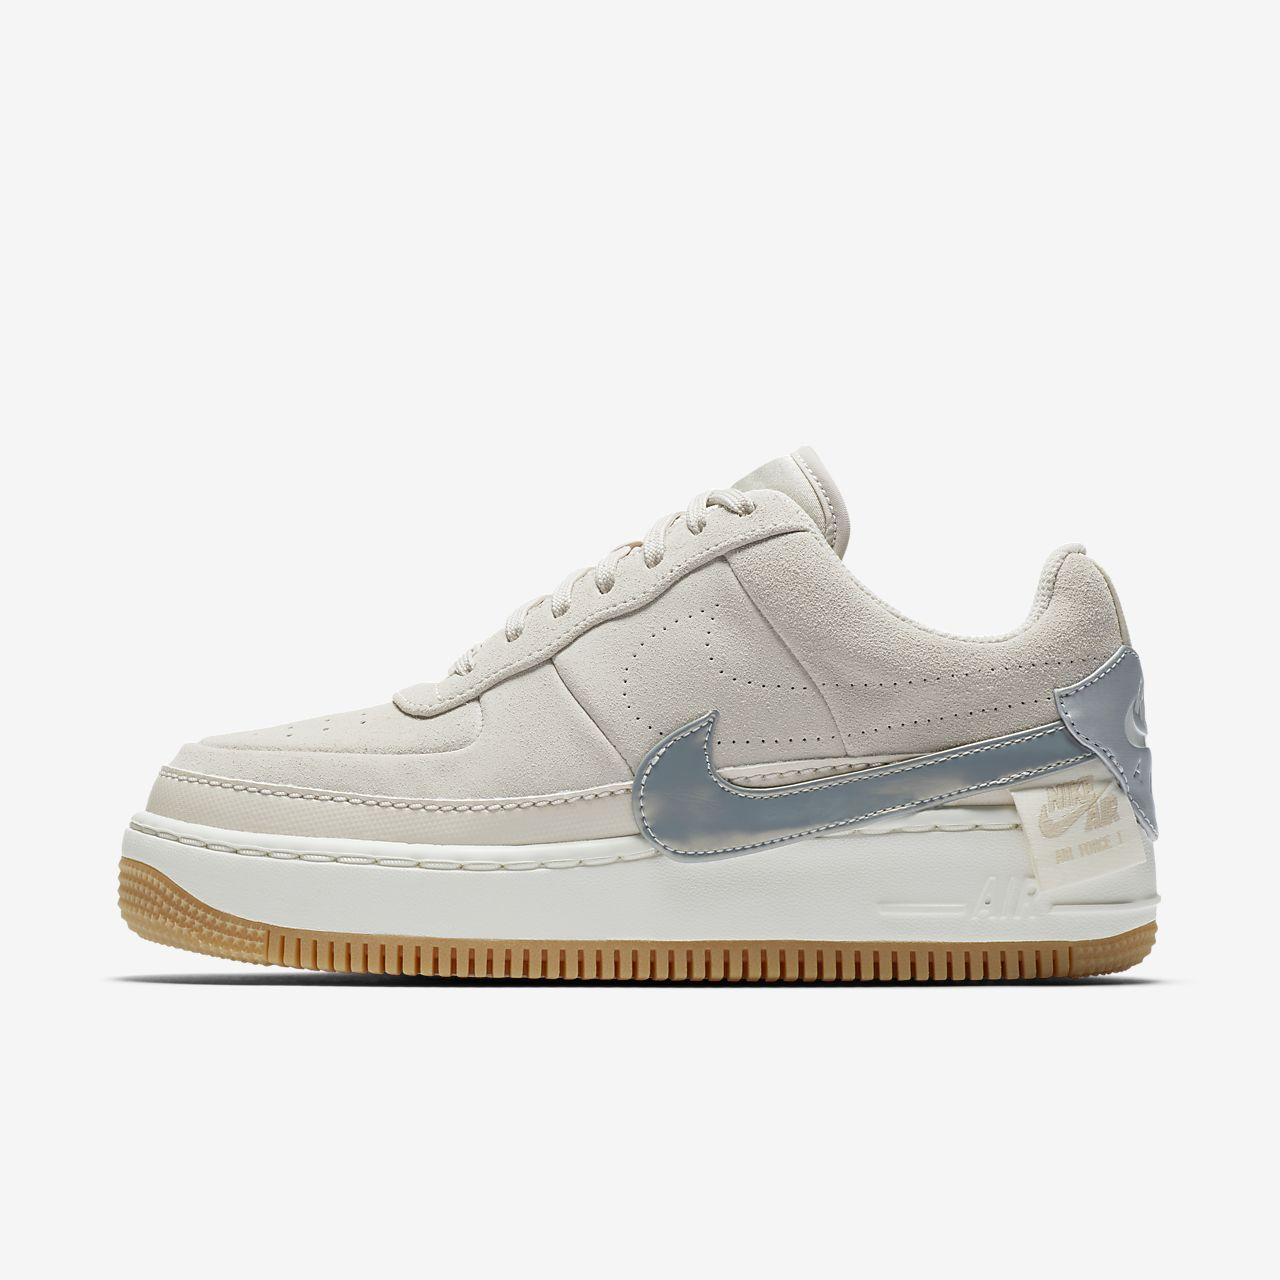 Sko Nike Air Force 1 Jester Suede Metallic för kvinnor